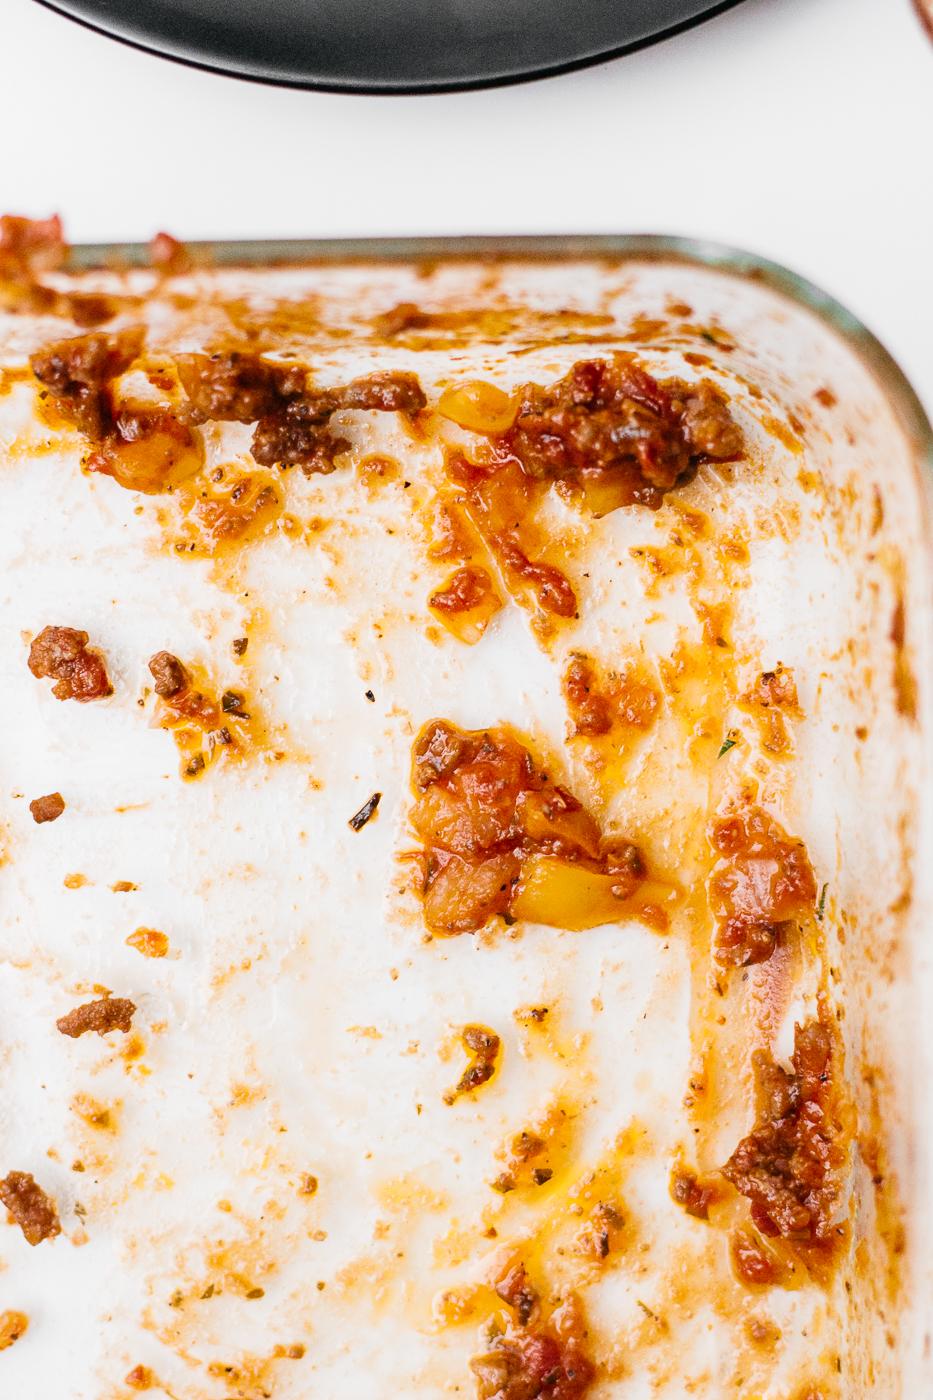 four cheese lasagna, weeknight dinner recipes, lasagna recipe, the kentucky gent, mens cooking blog